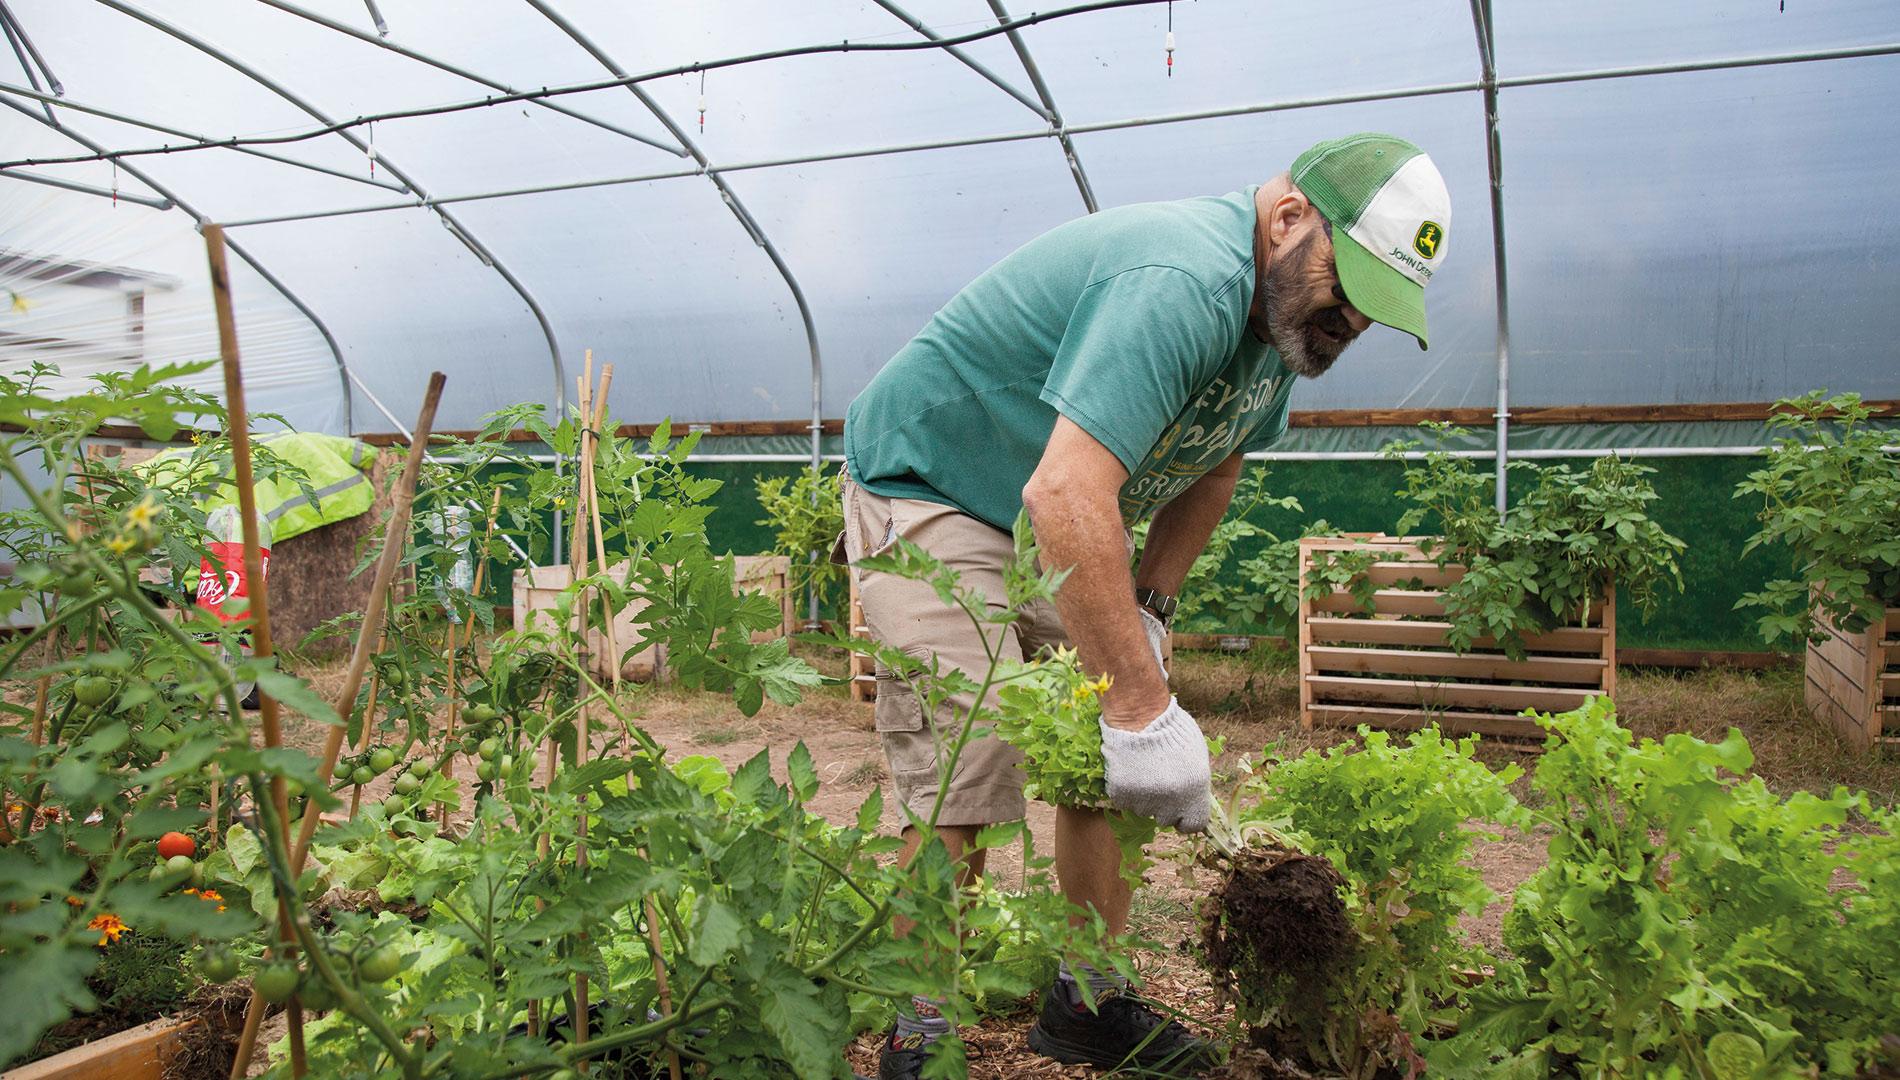 Man harvesting vegetables in a community garden